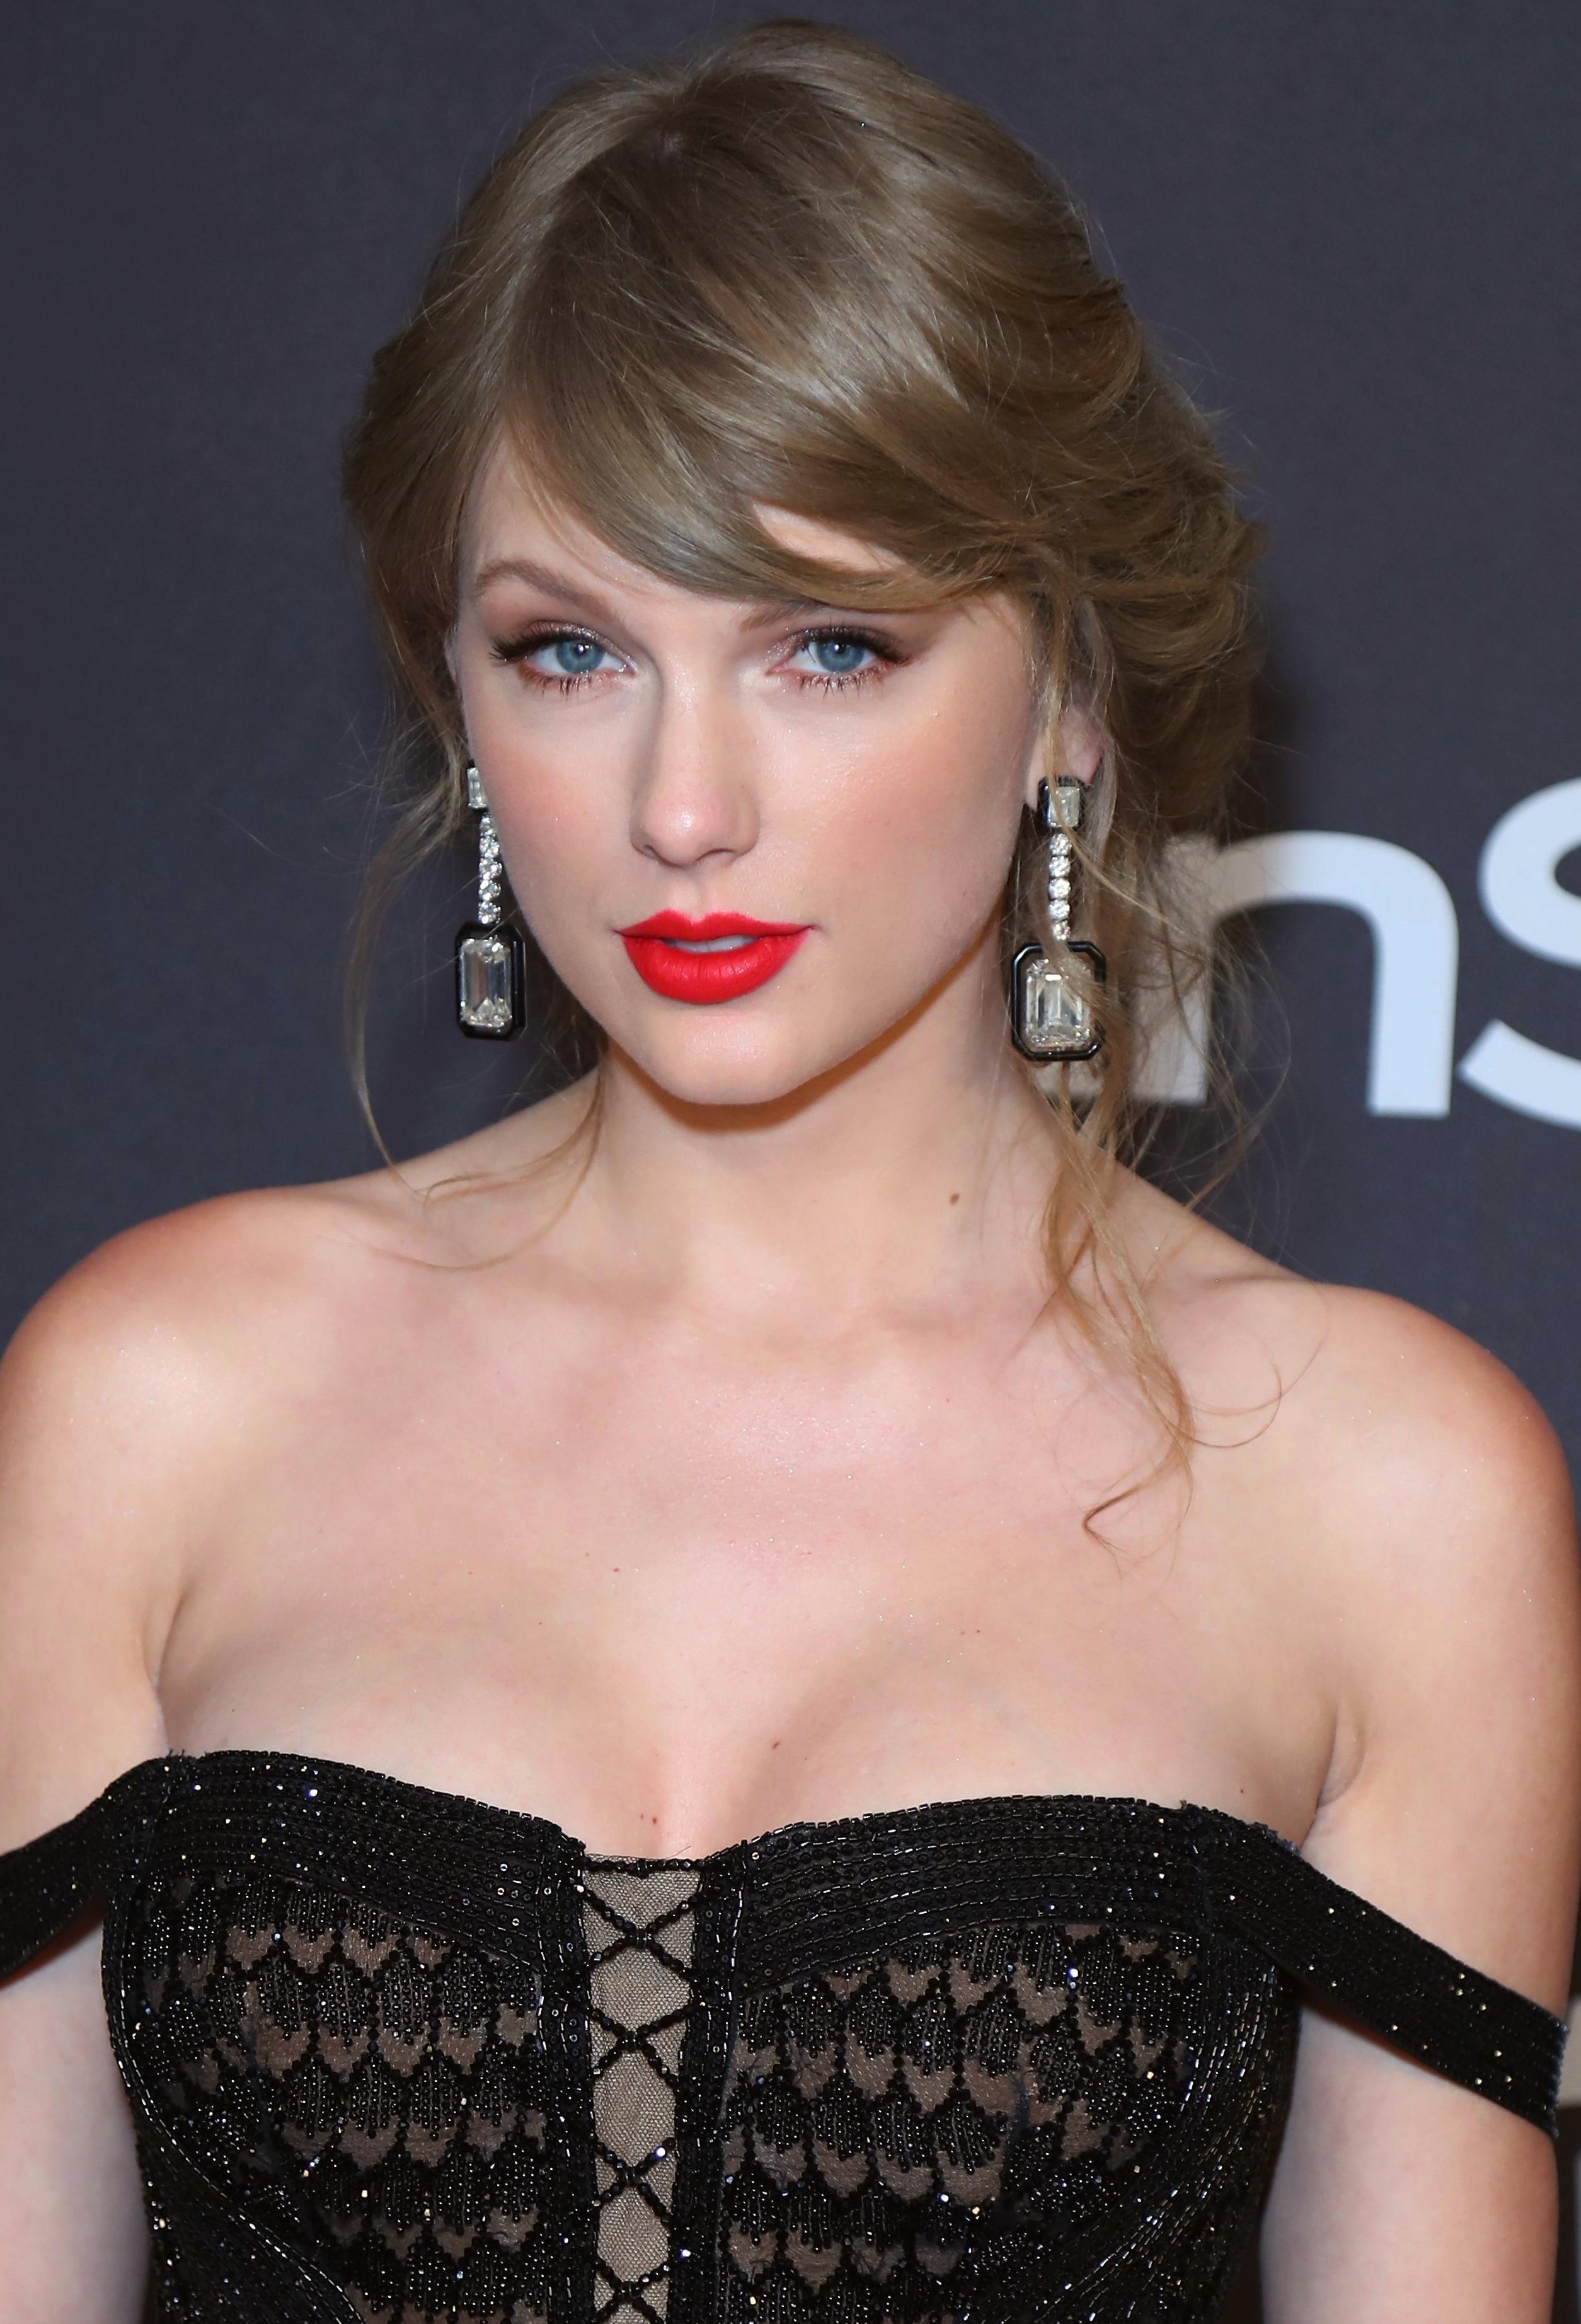 Sexy Girl | Taylor Swift Fashion | Taylor Swift Instagram